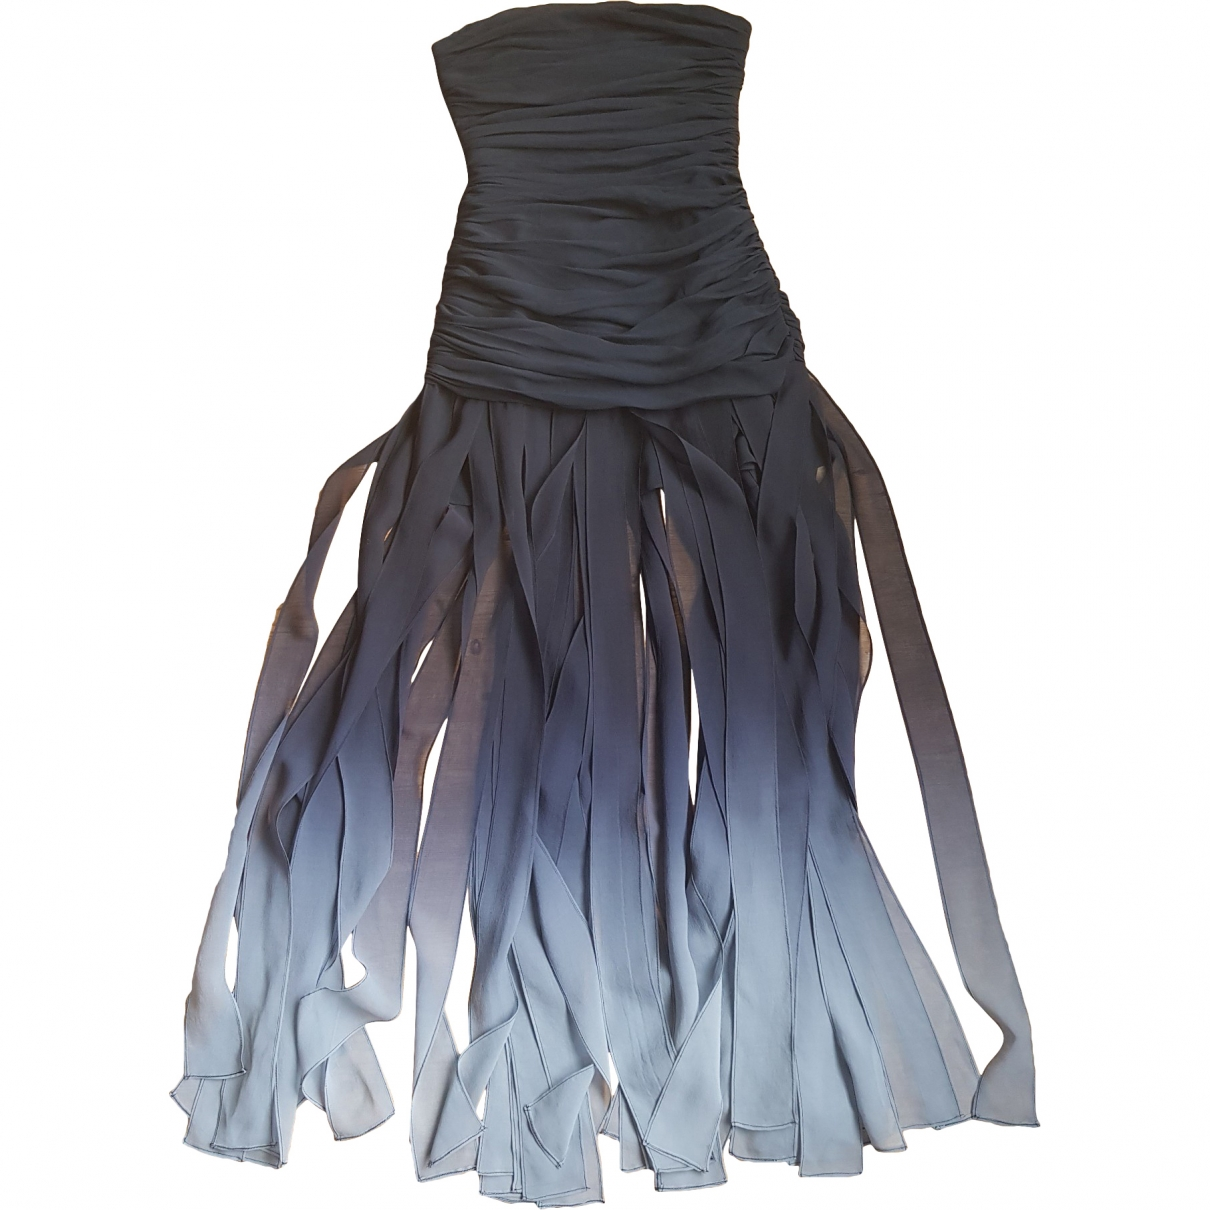 Bcbg Max Azria \N Black Silk dress for Women 4 US